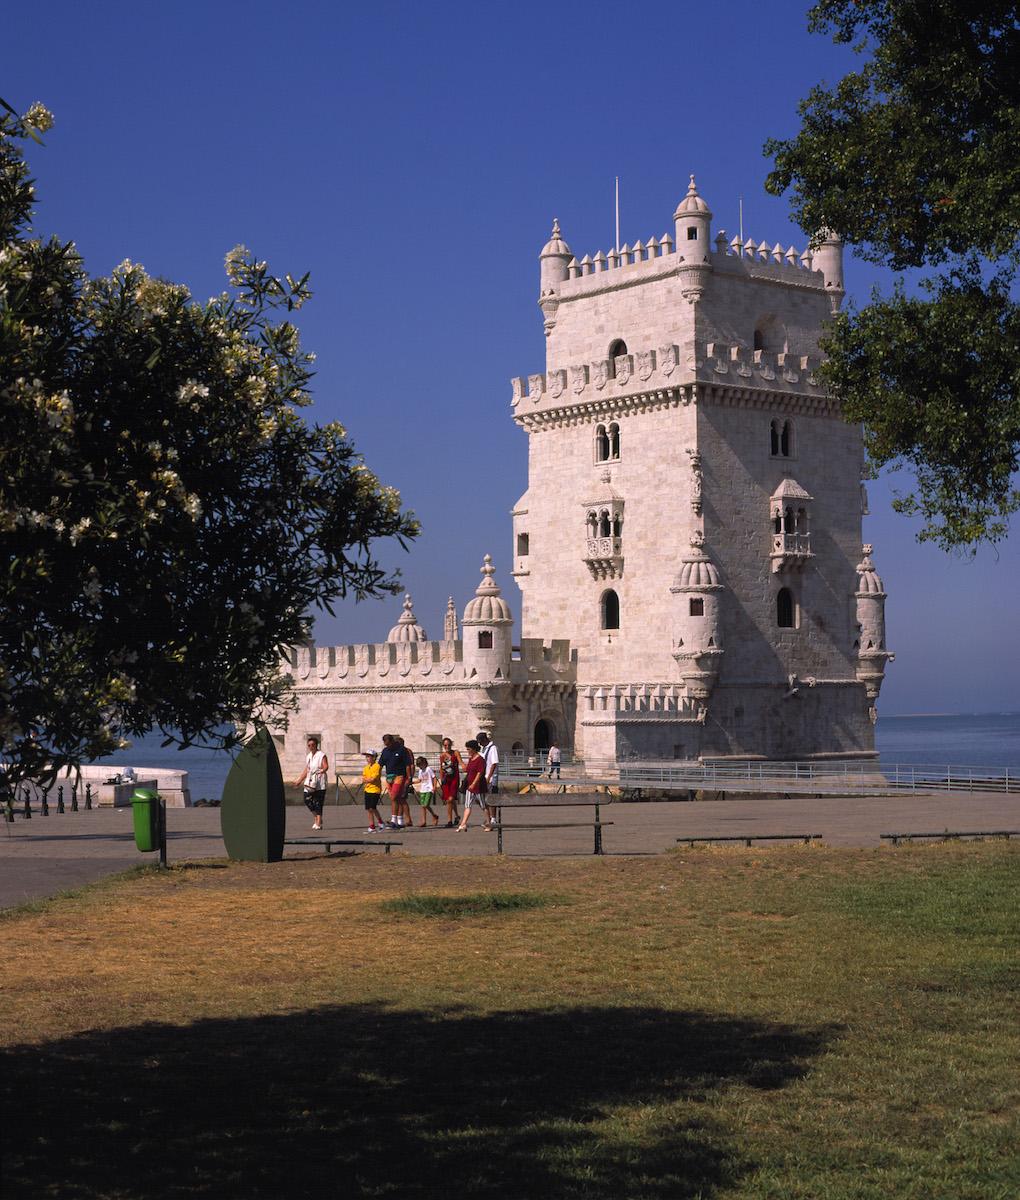 Torre de Belem. Foto: Turismo de Portugal.